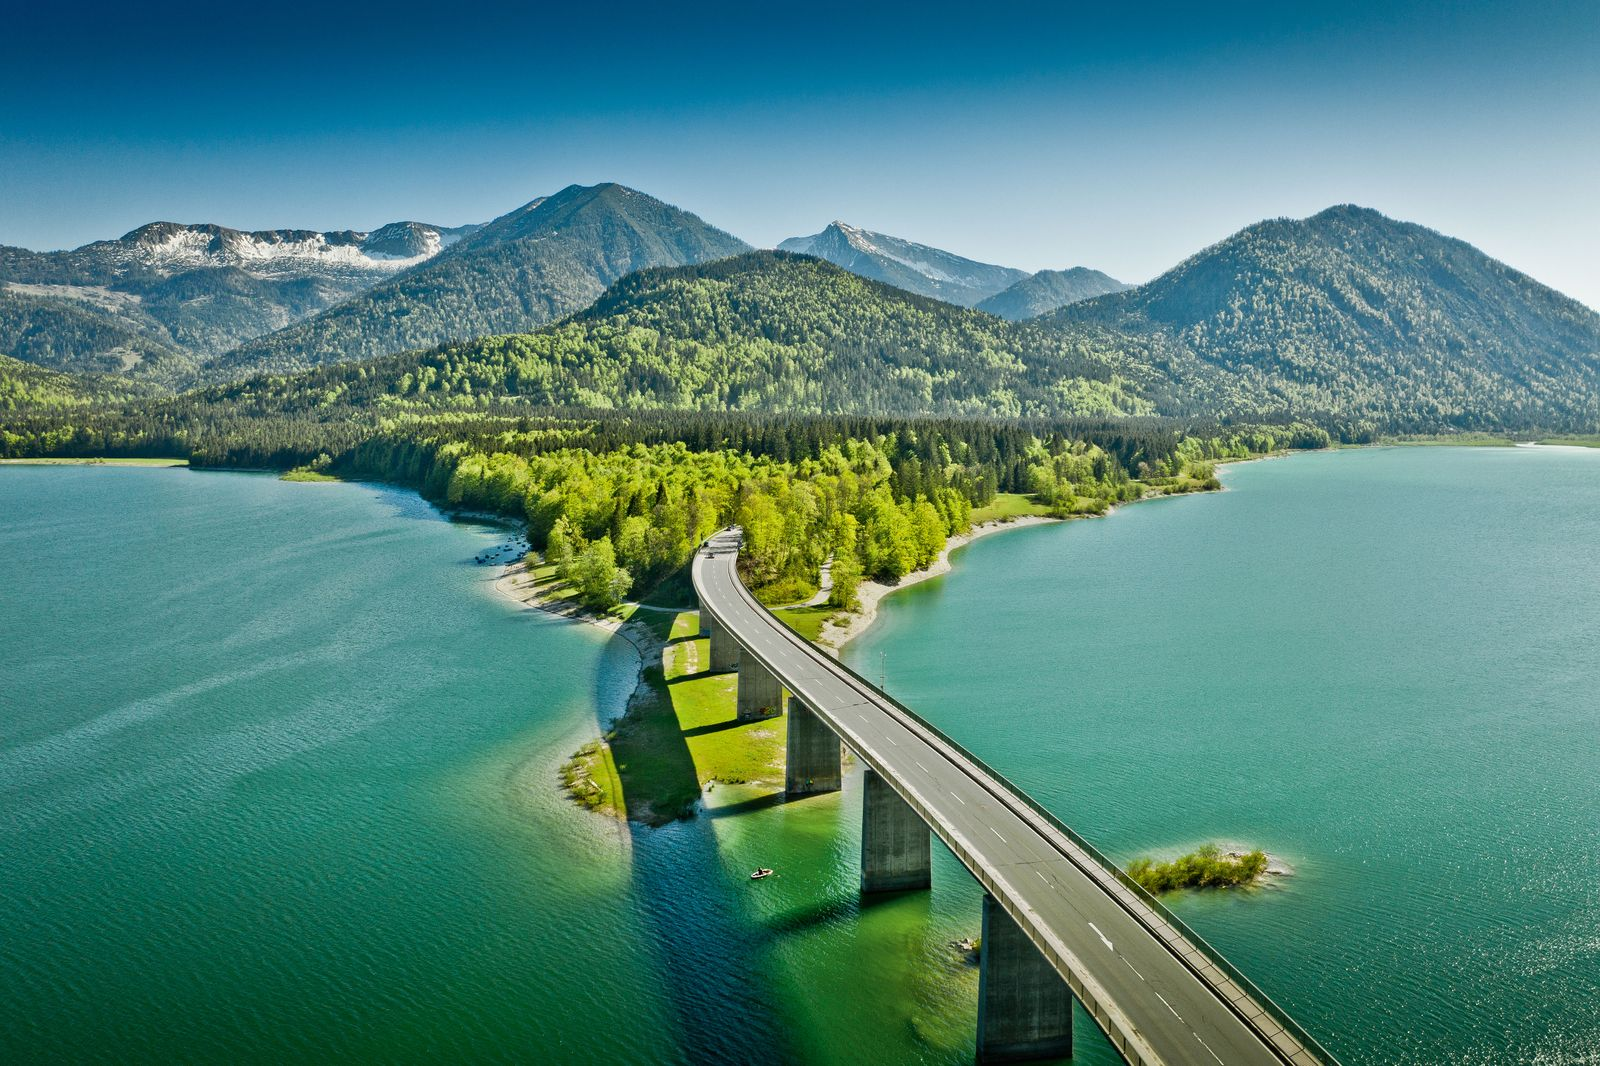 BUCHCOVER / Curves / Delius Klasing Verlag / Brücke